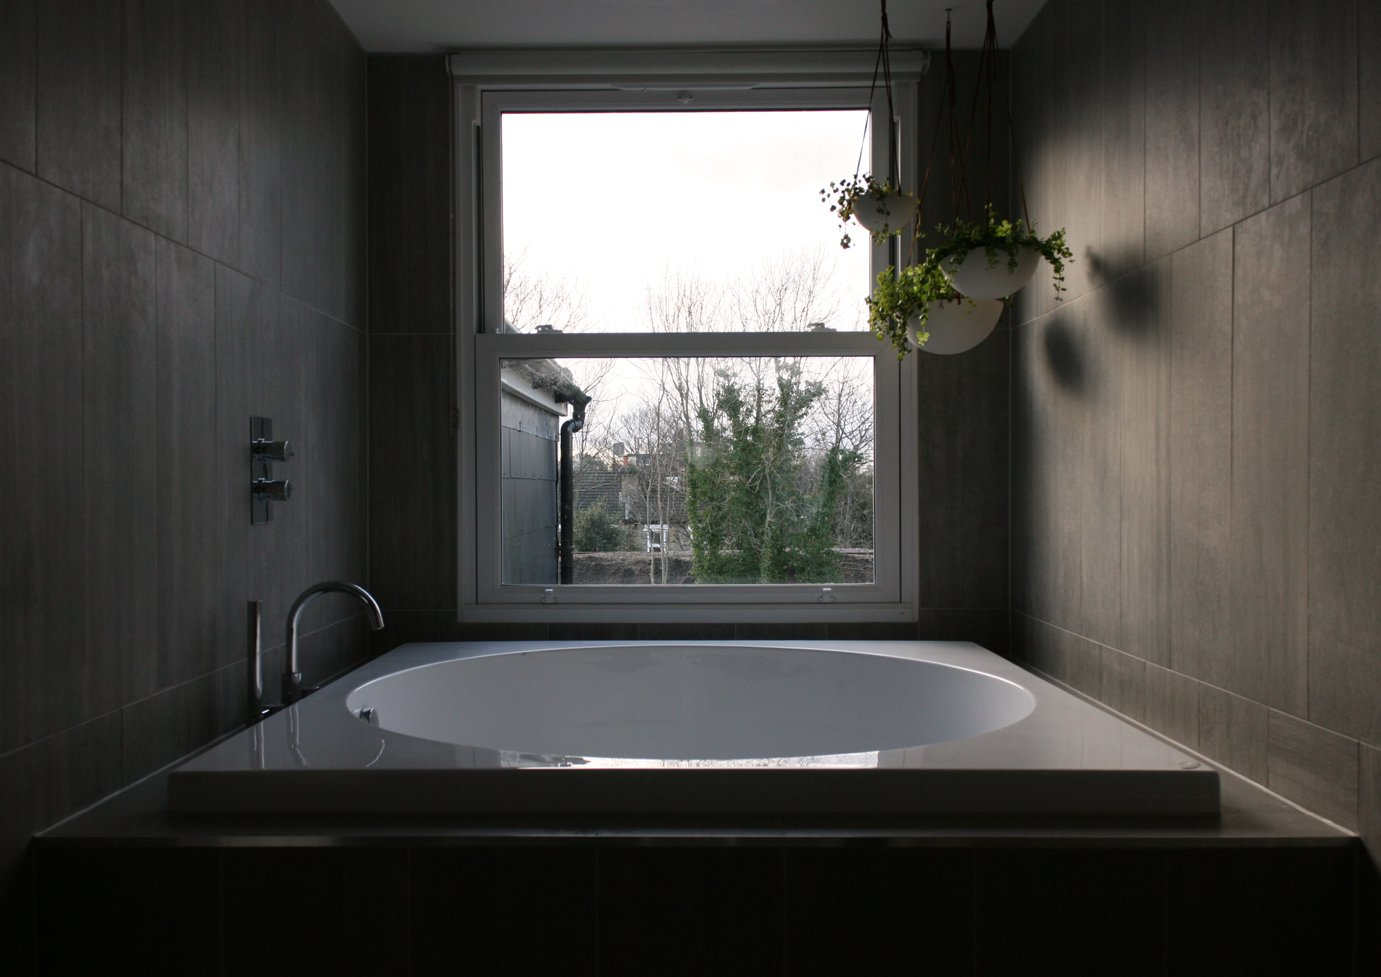 Bath Room, Alcove Tub, Ceramic Tile Wall, Engineered Quartz Counter, and Ceramic Tile Floor En-suite bathroom with feature bath tub  The Yellow Door by Tactus Design Workshop